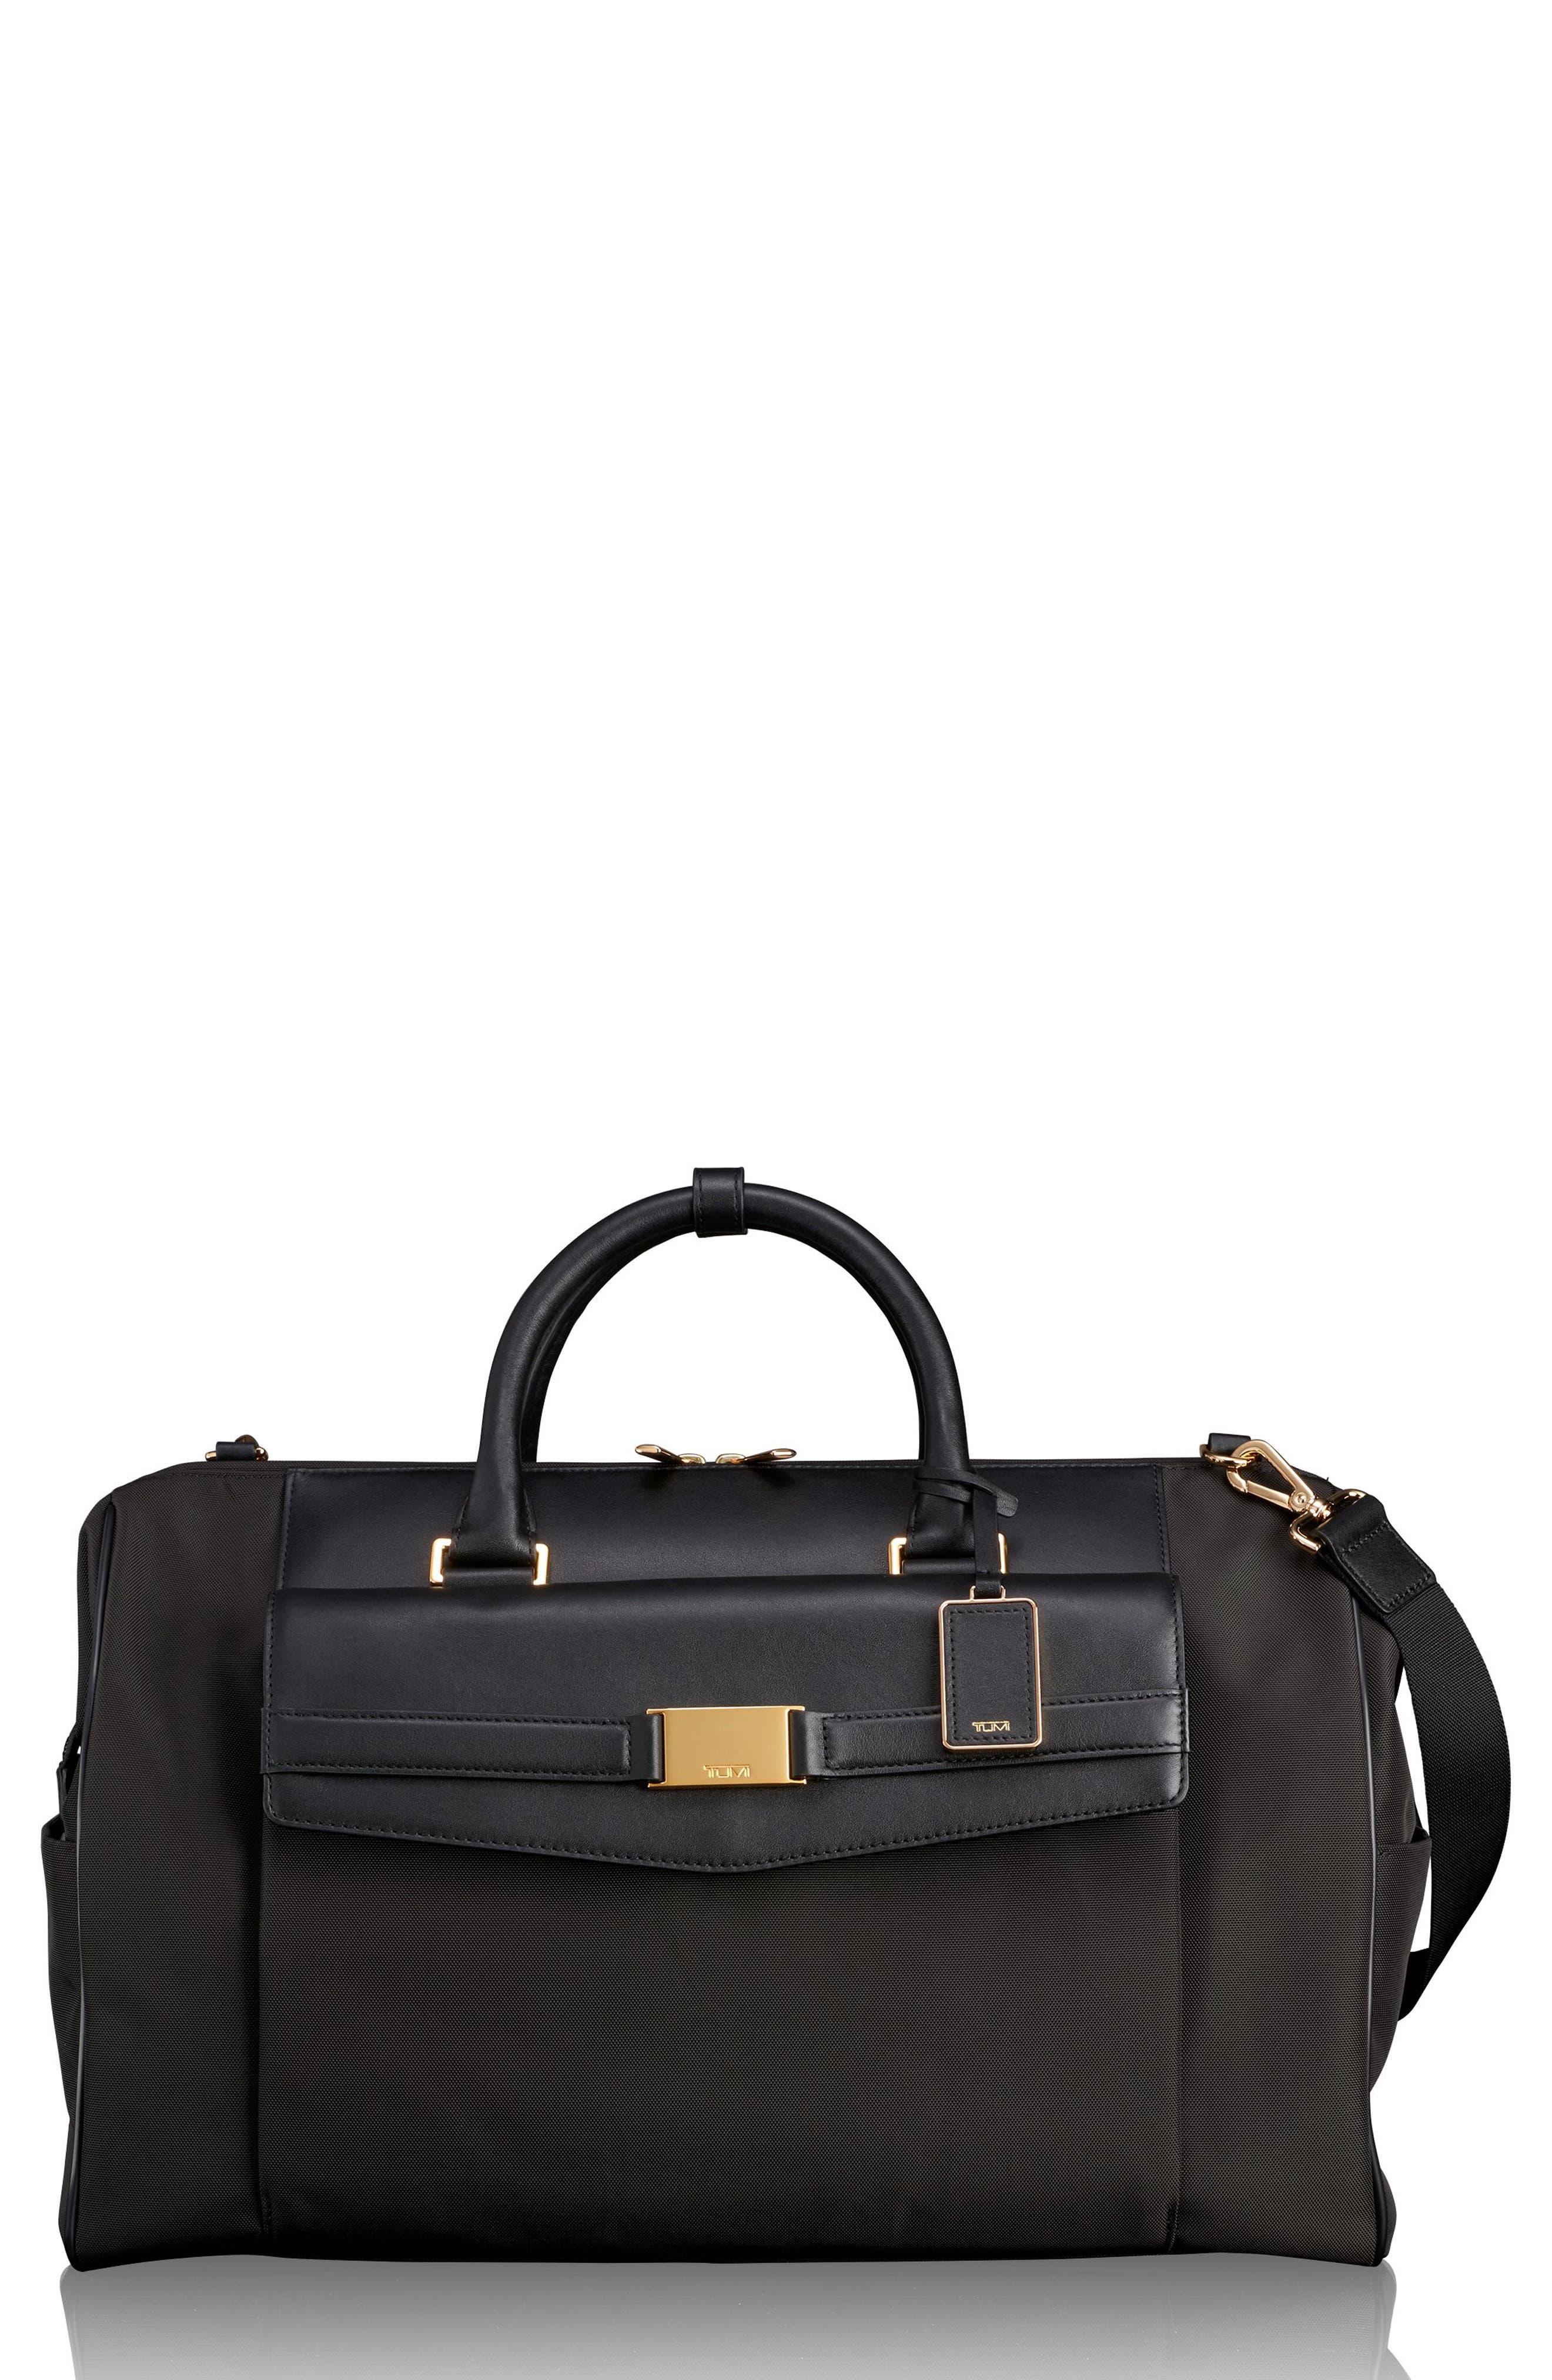 Main Image - Tumi Larkin - Allendale Nylon Duffel Bag